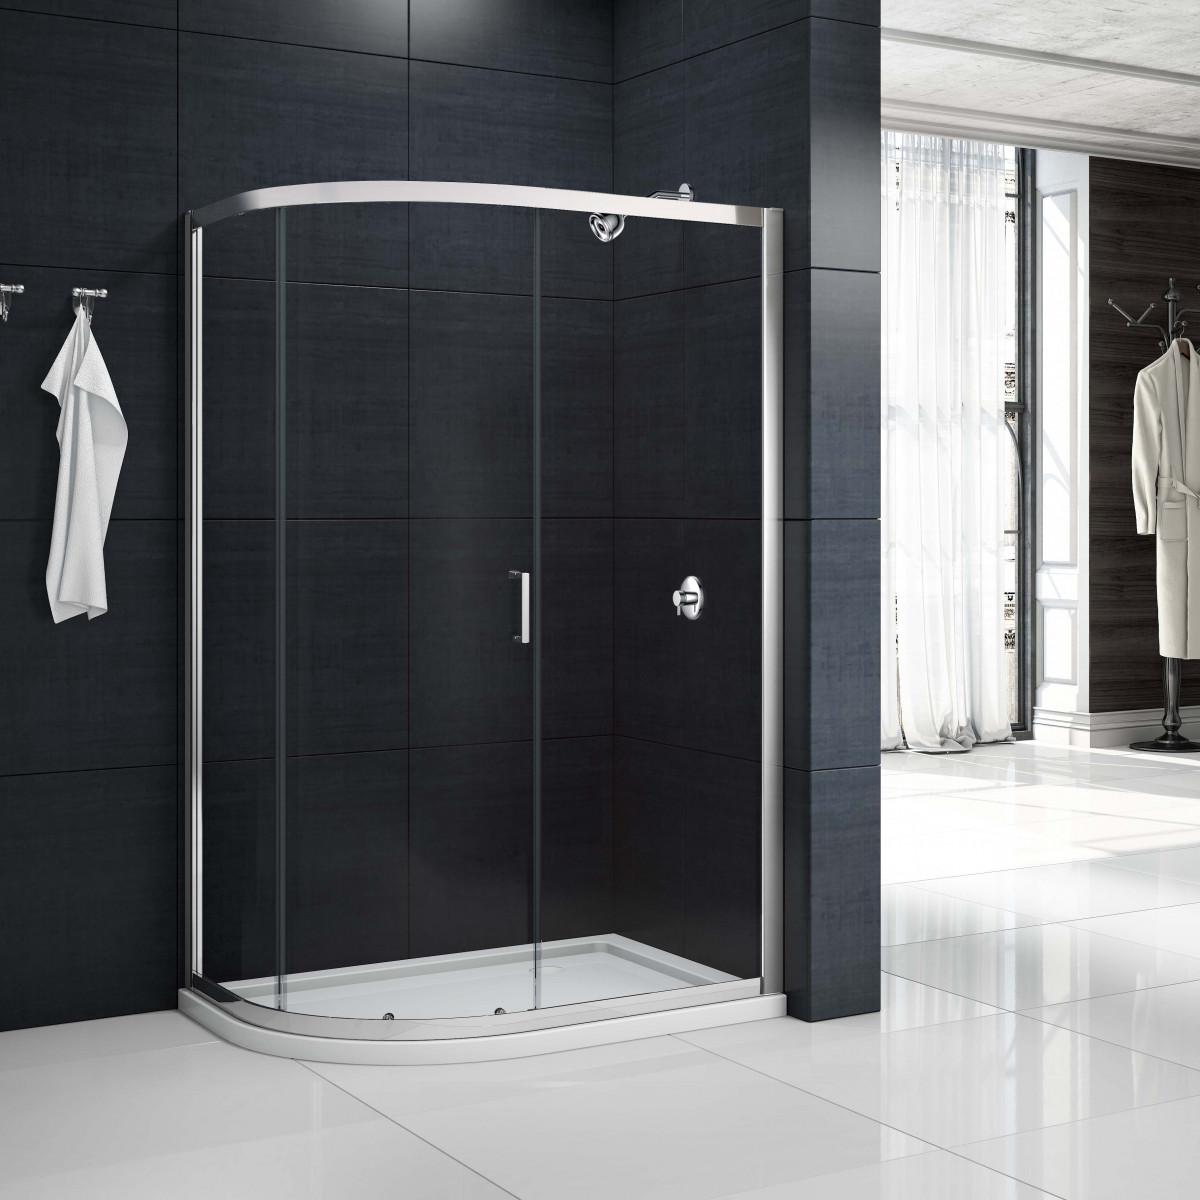 Merlyn Mbox 1 Door Offset Quadrant Shower Enclosure 1200 X